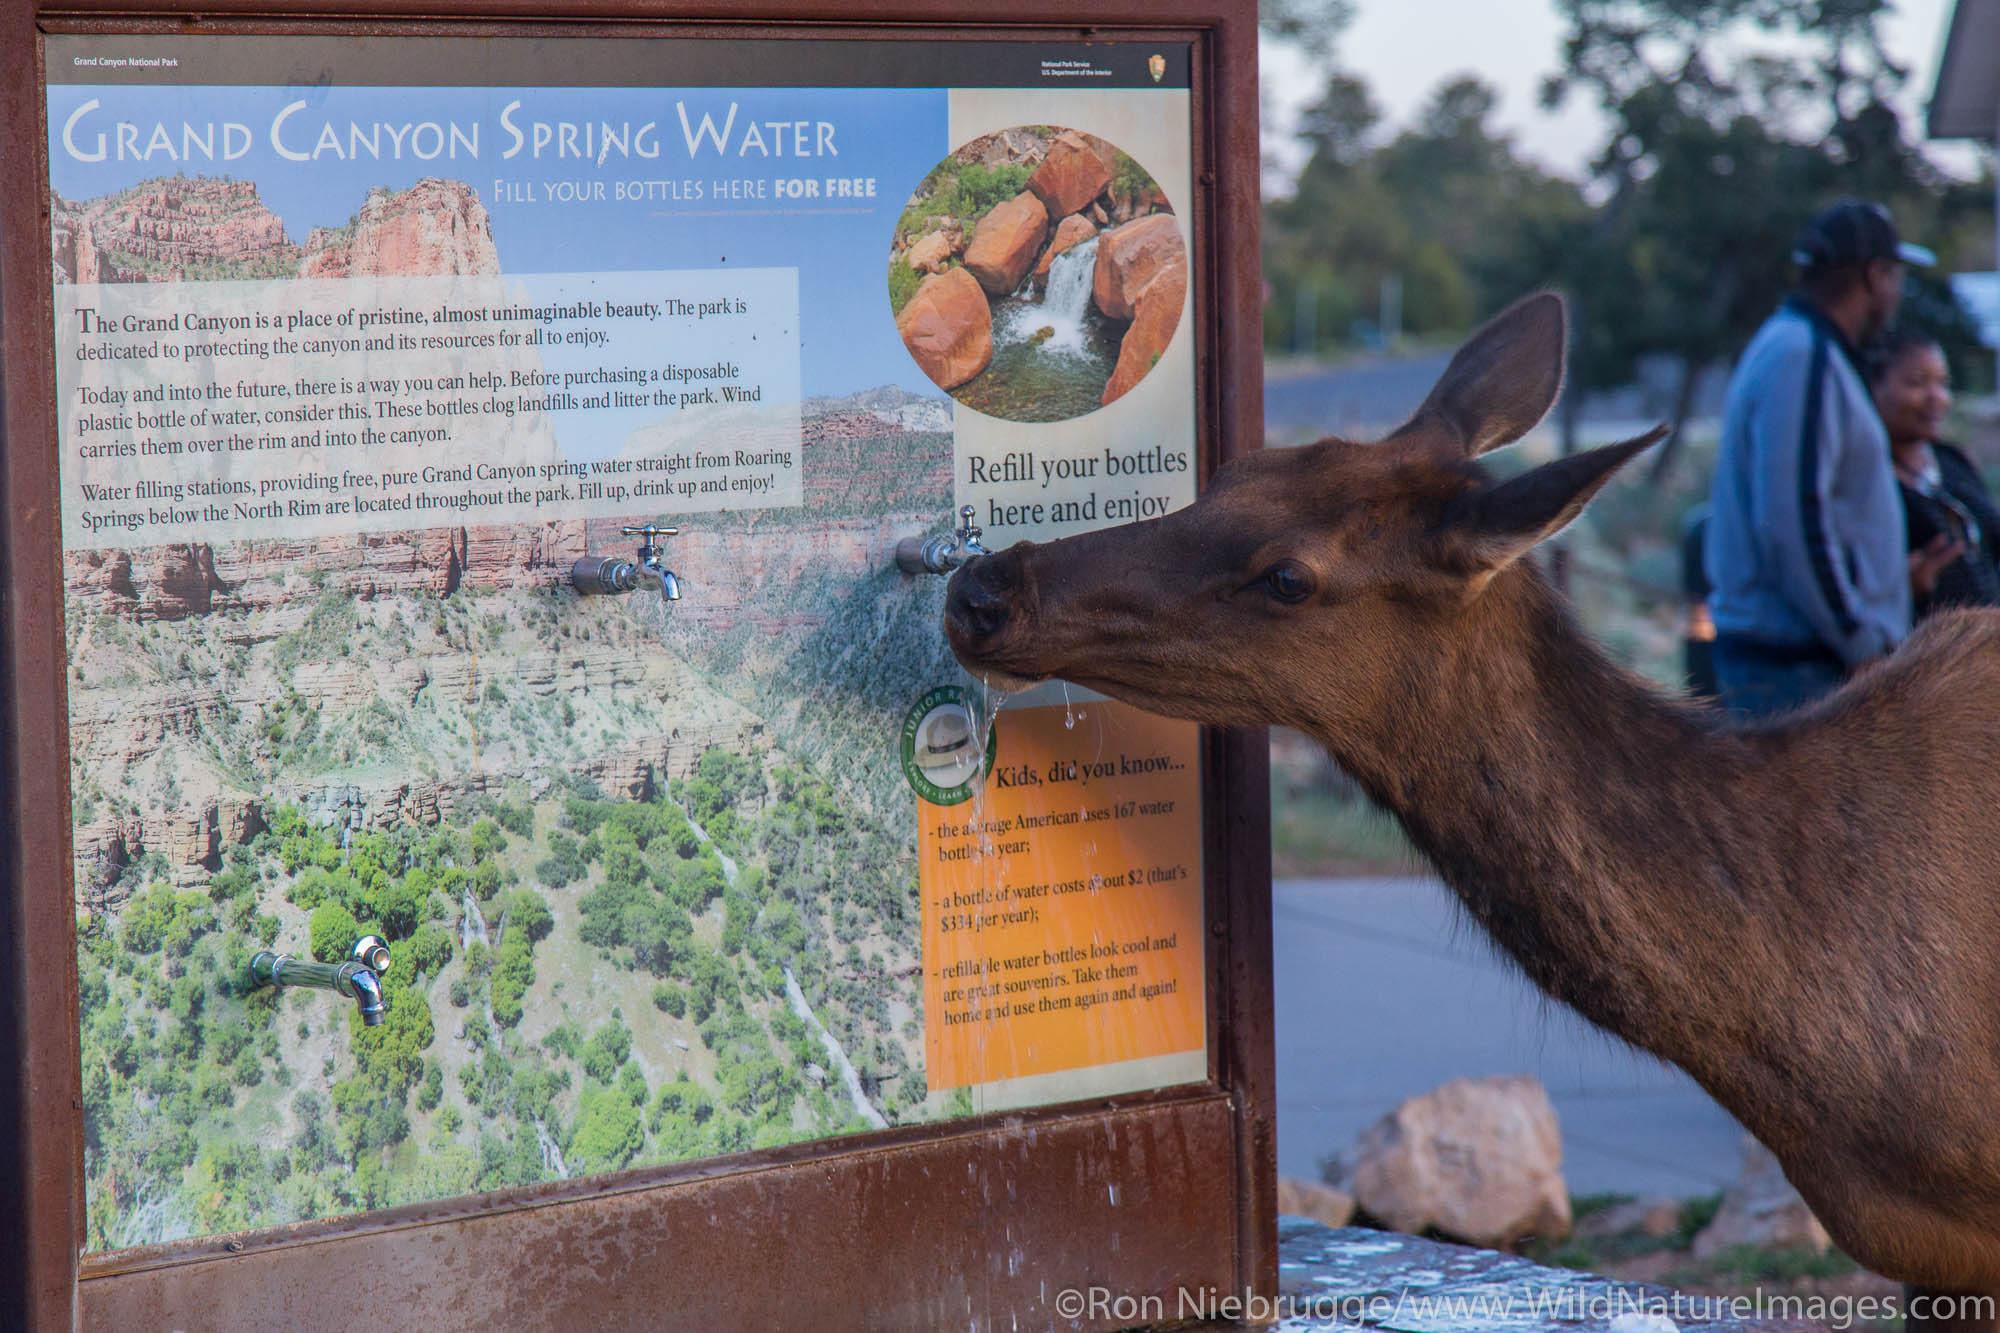 Elk at a water fountain, Grand Canyon National Park, Arizona.